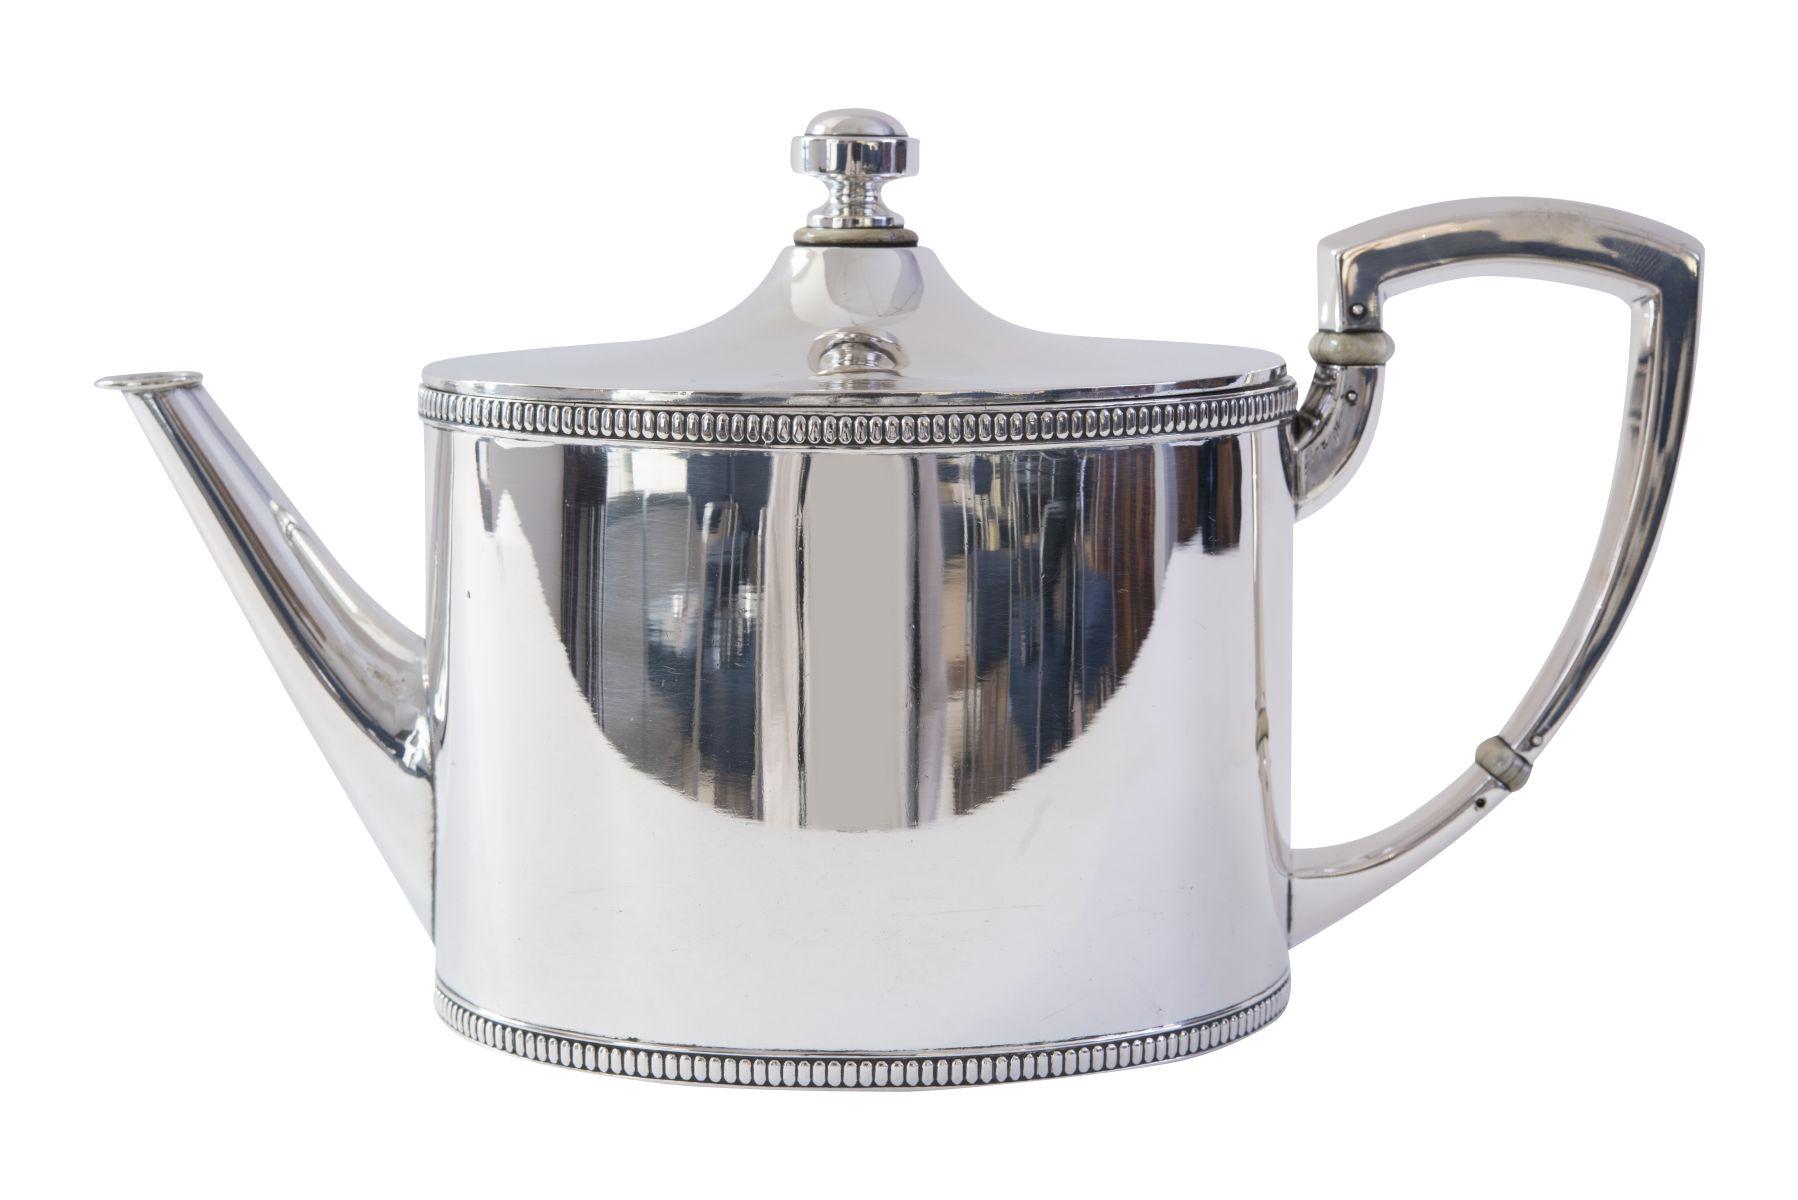 #105 Silver Teapot | Teekanne Silber Image